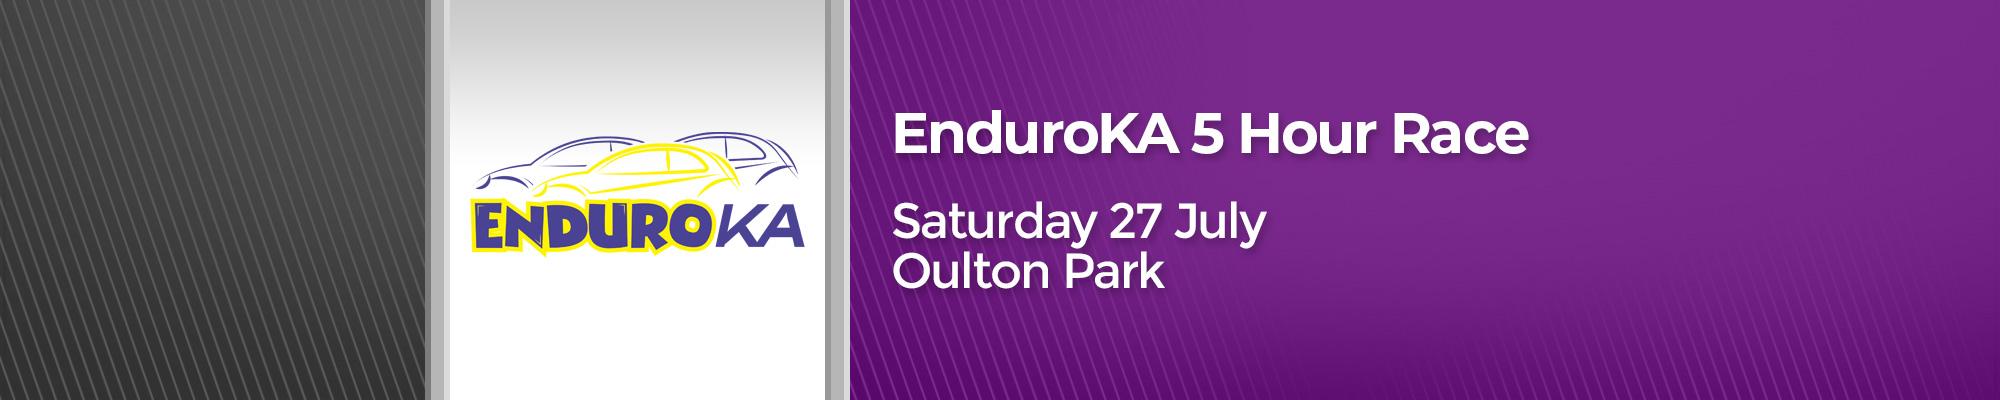 EnduroKA 5 Hour Race (MSVR)